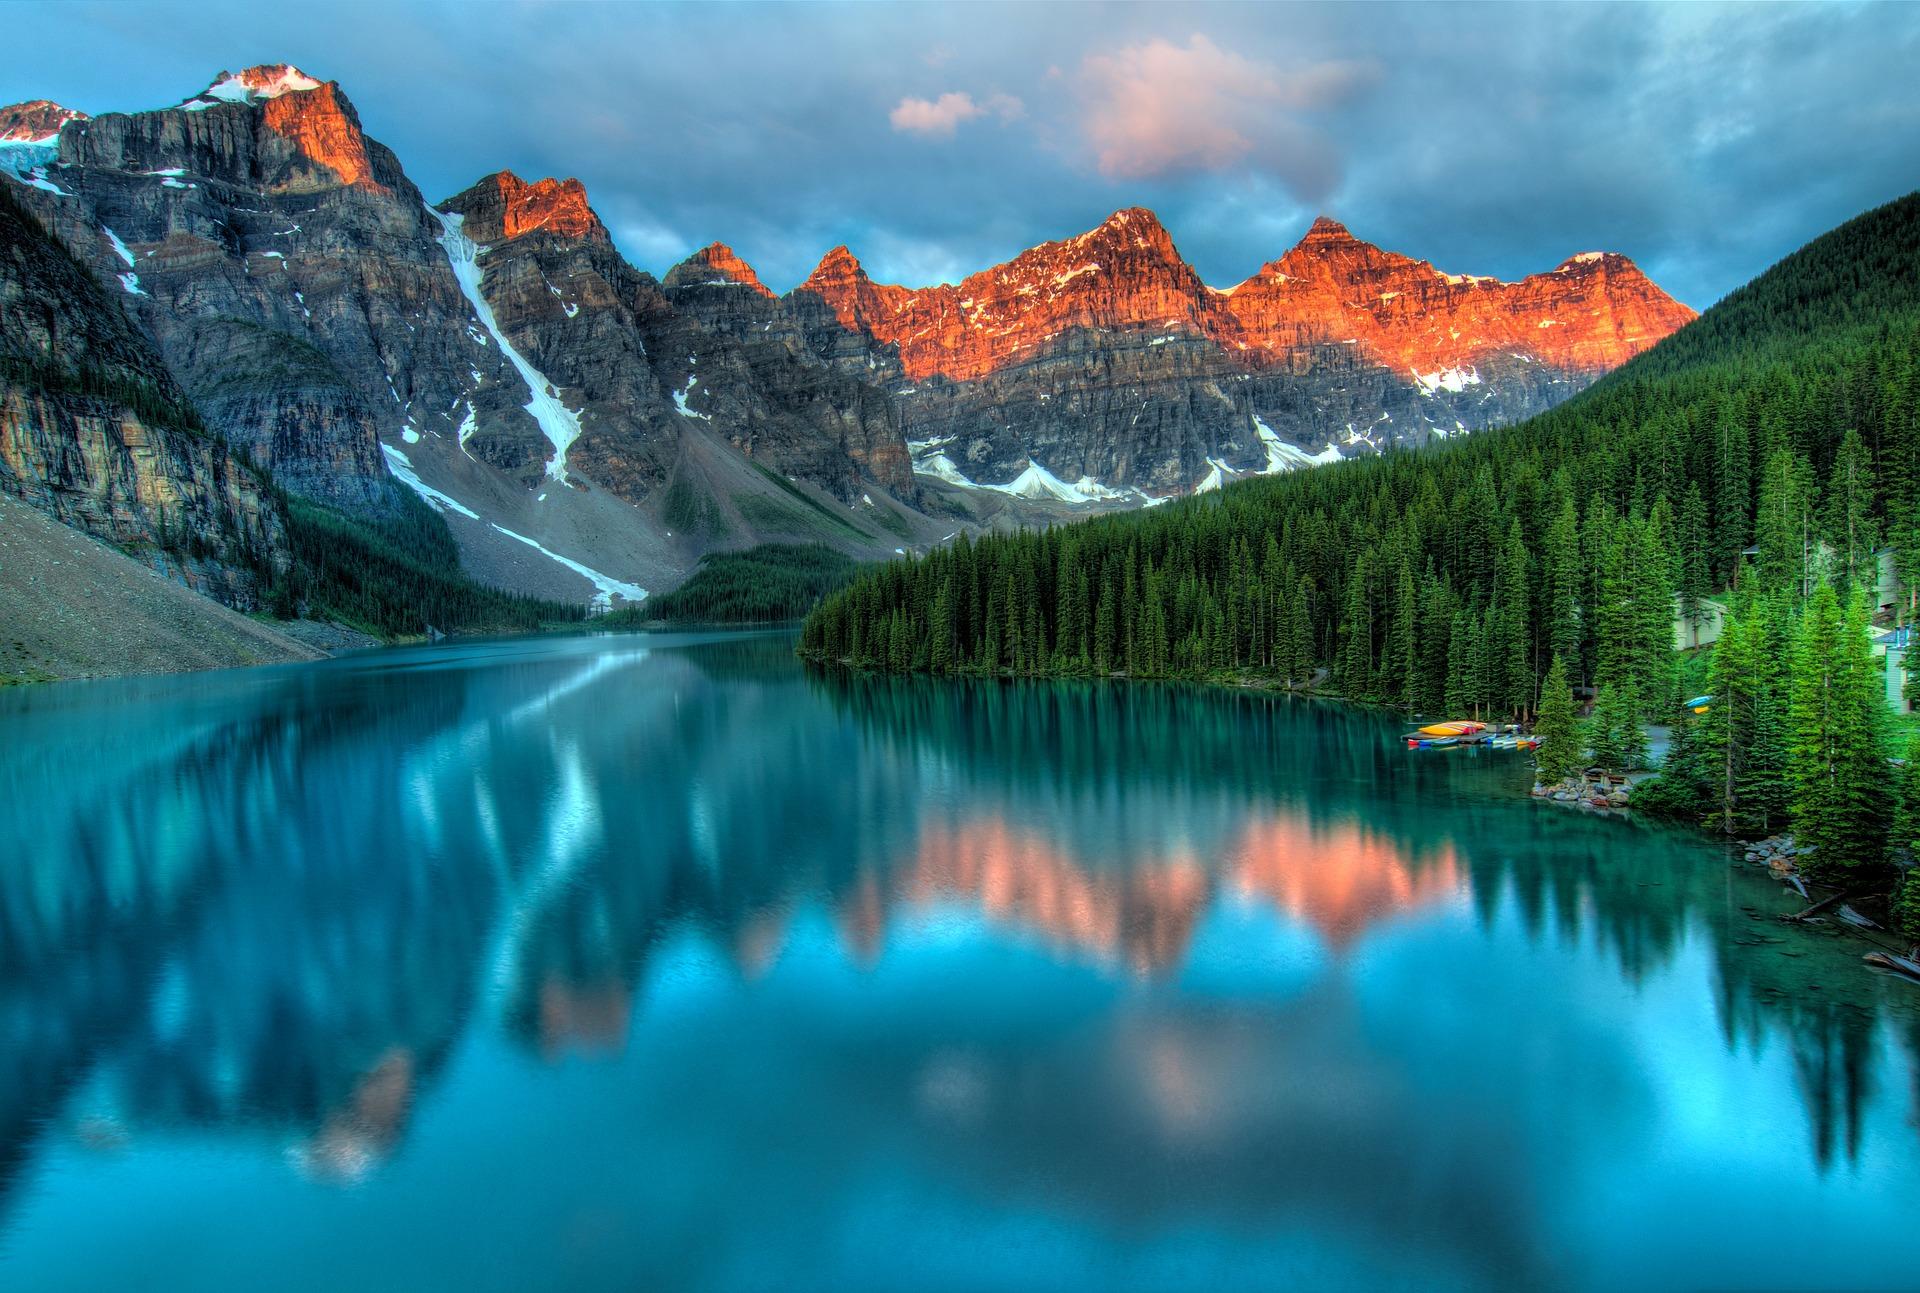 Velika, mirna voda- yin, oštri vrhovi planina - yang